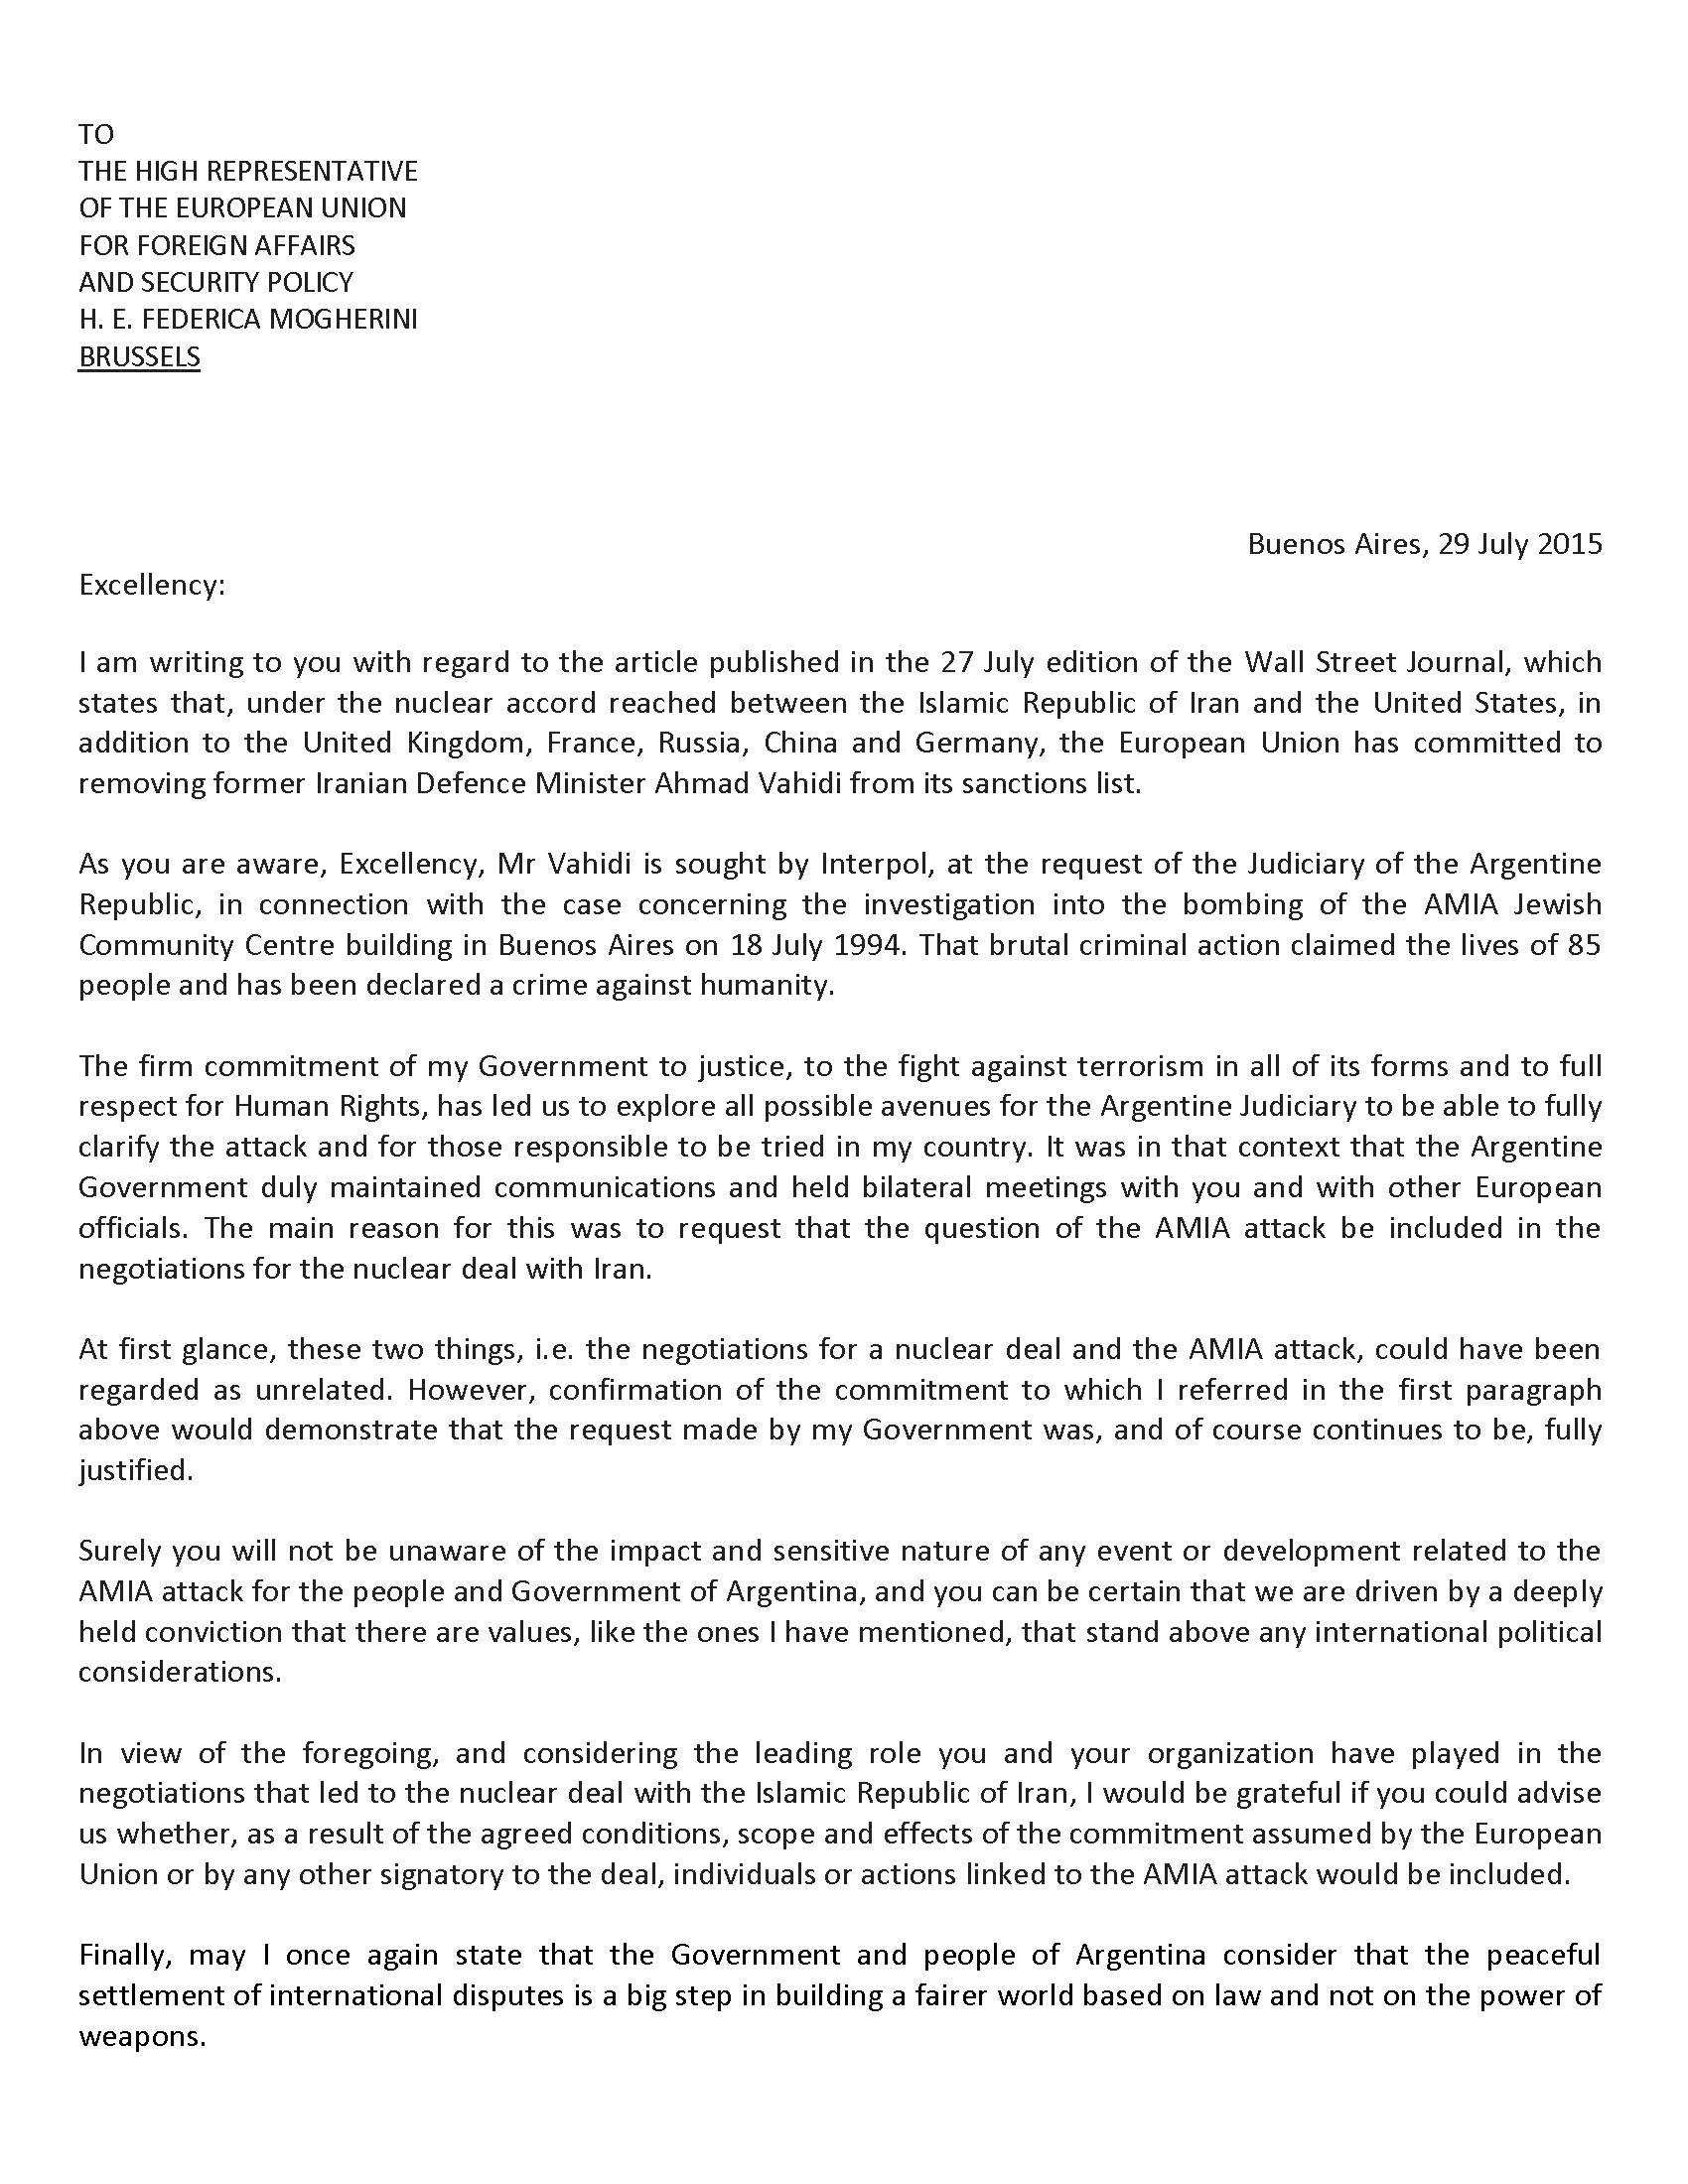 Nota a Mogherini en ingles (1)